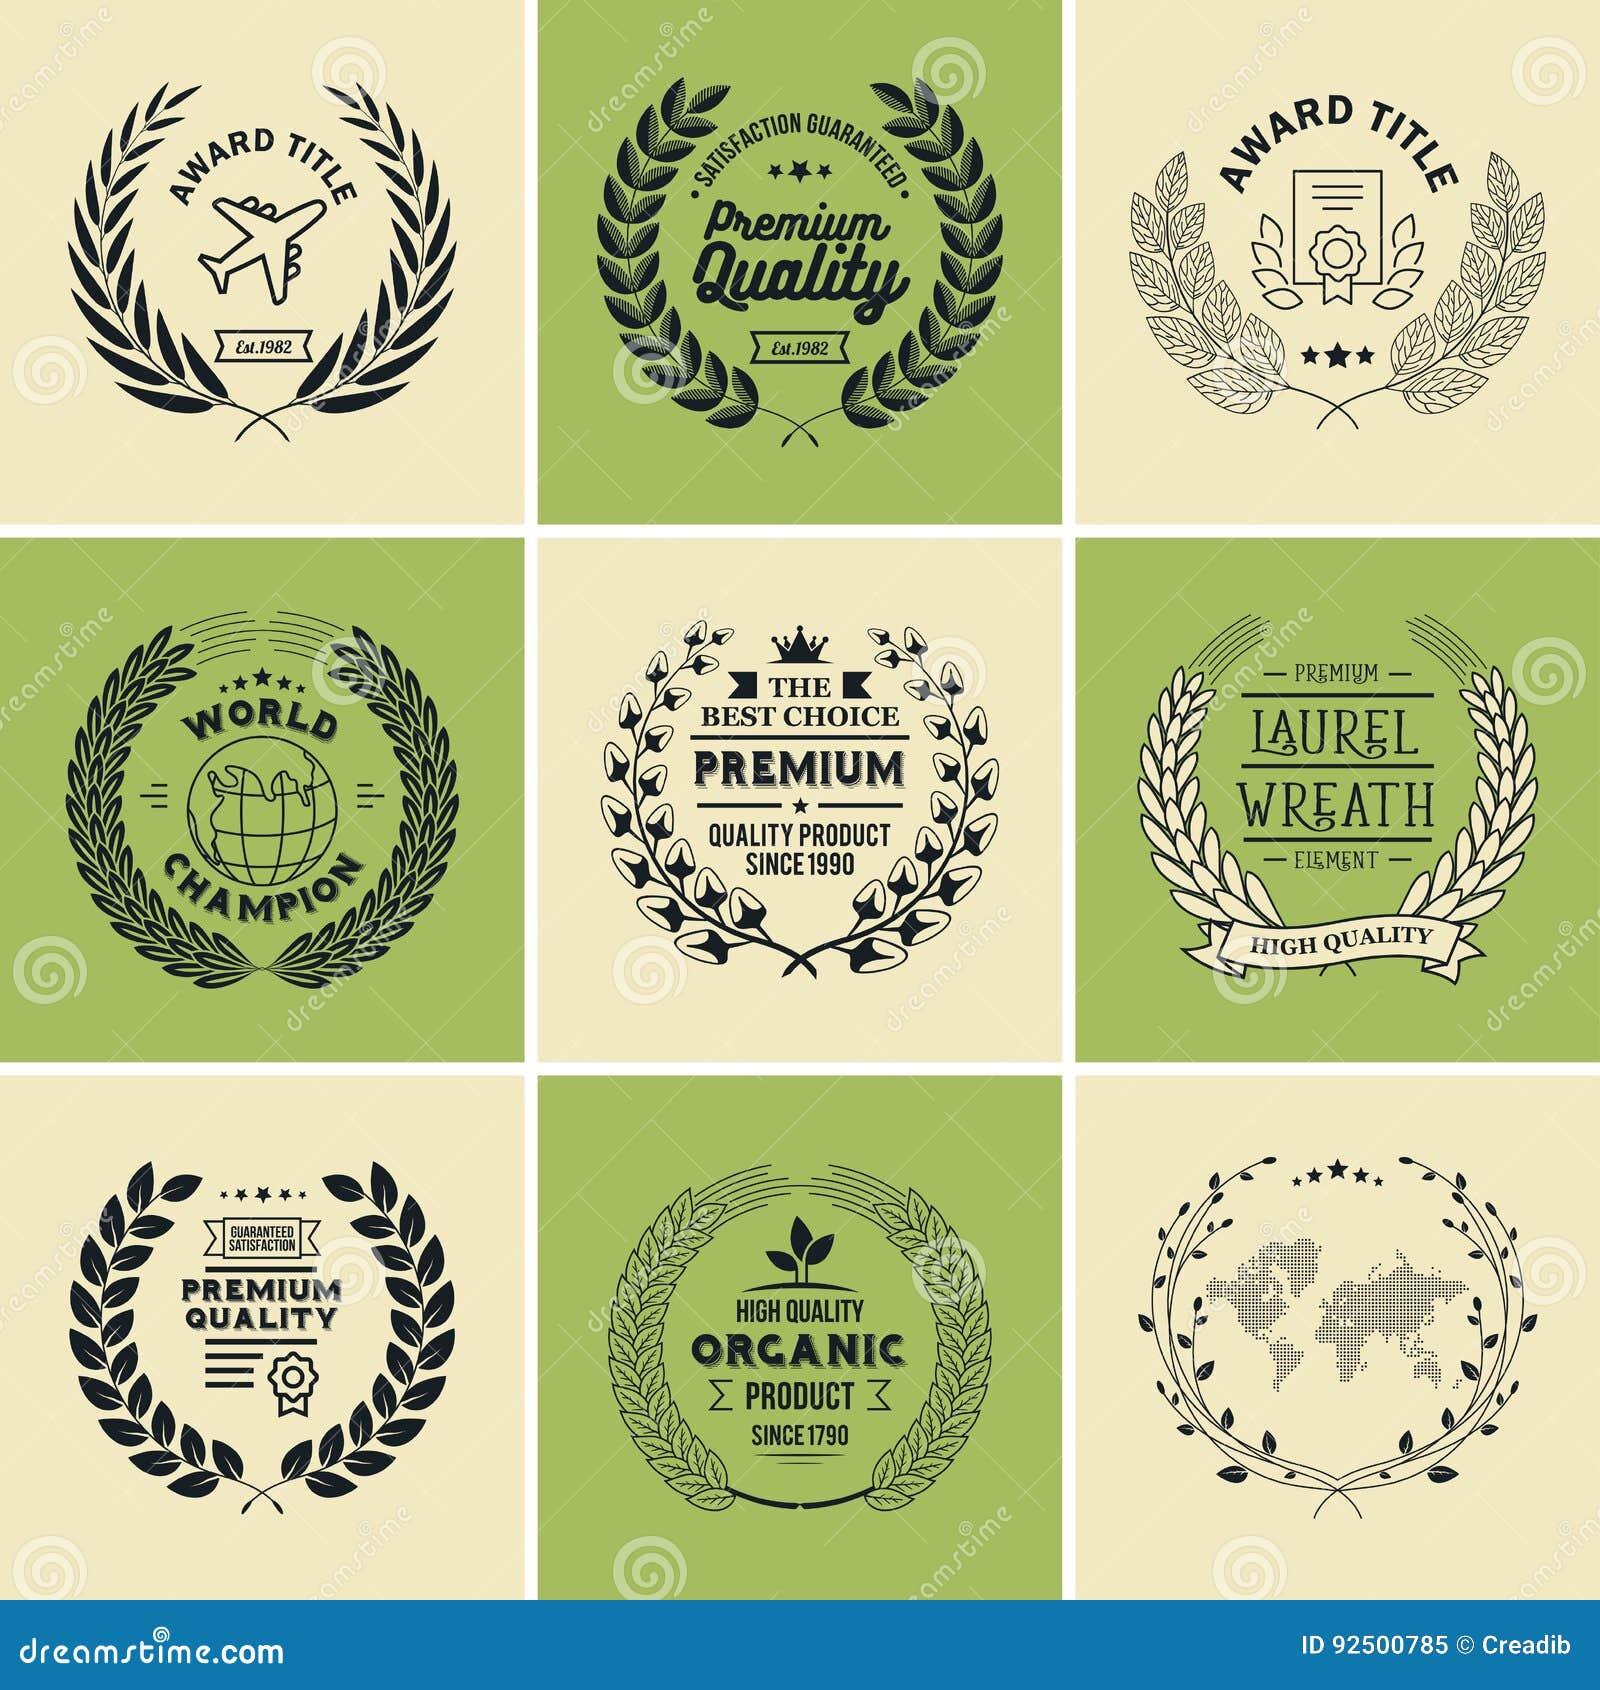 laurel wreath badges vector template for awards quality mark